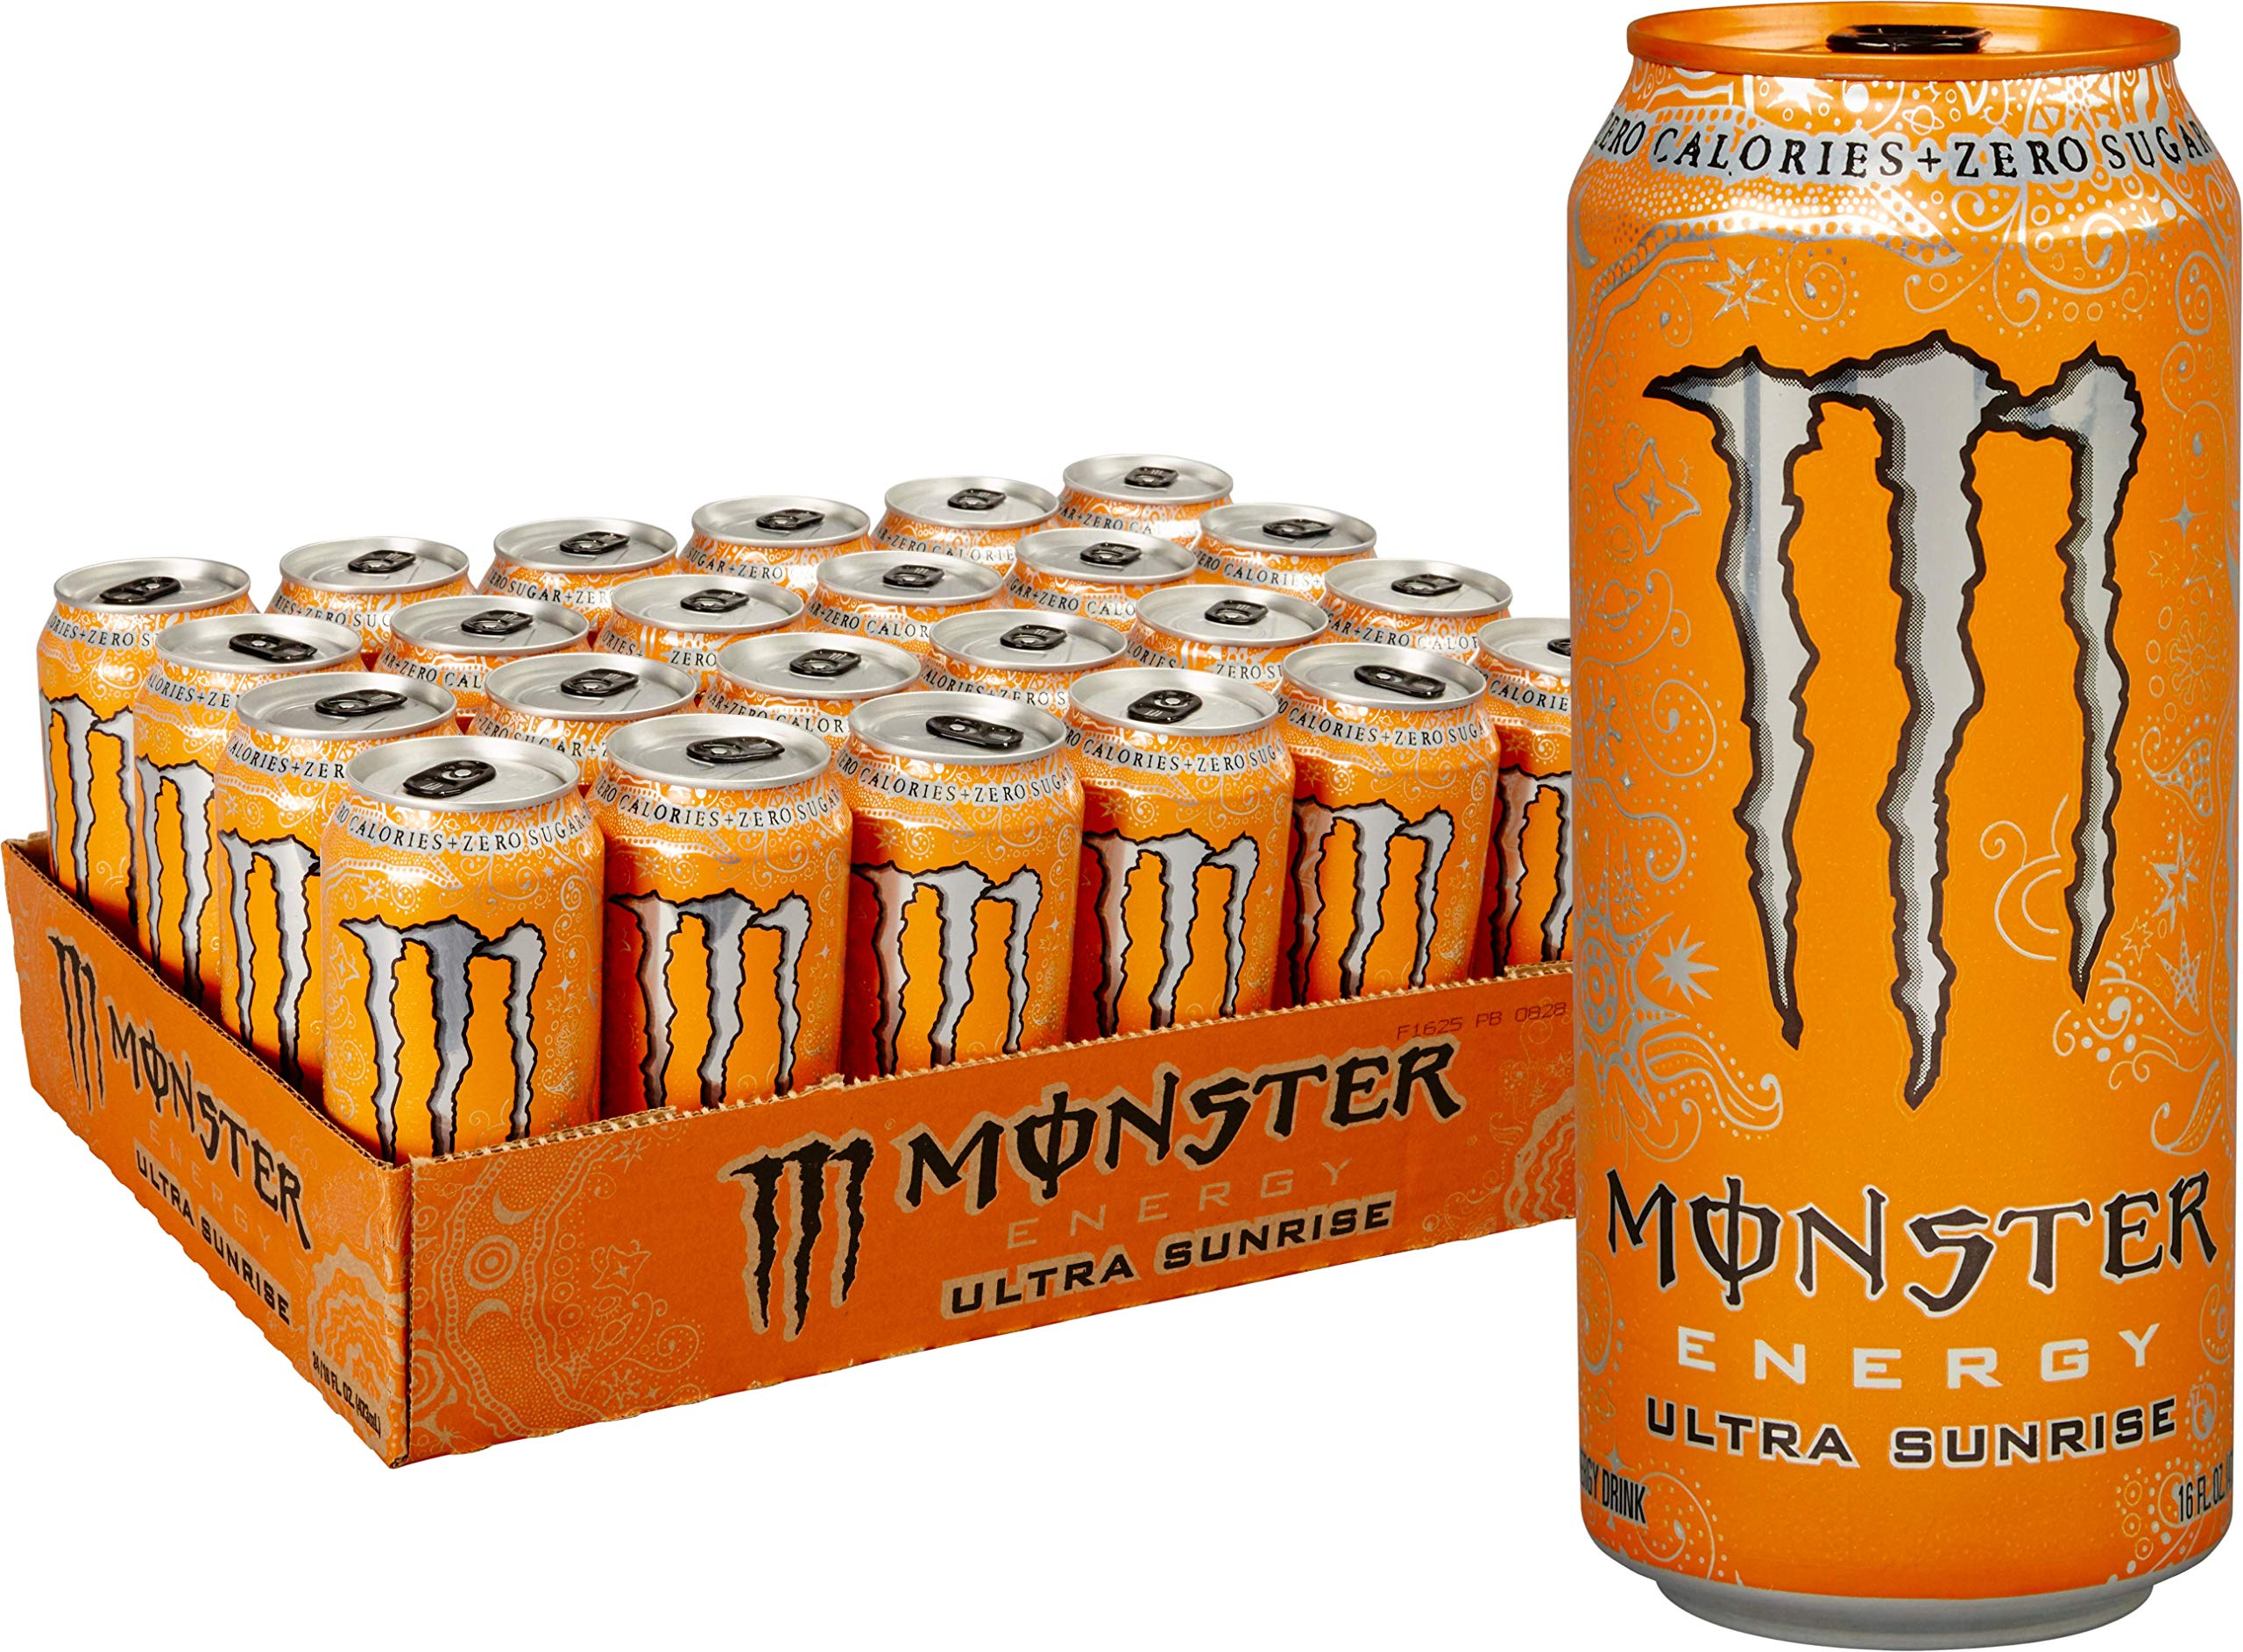 Monster energy drink tab prizes for carnival games